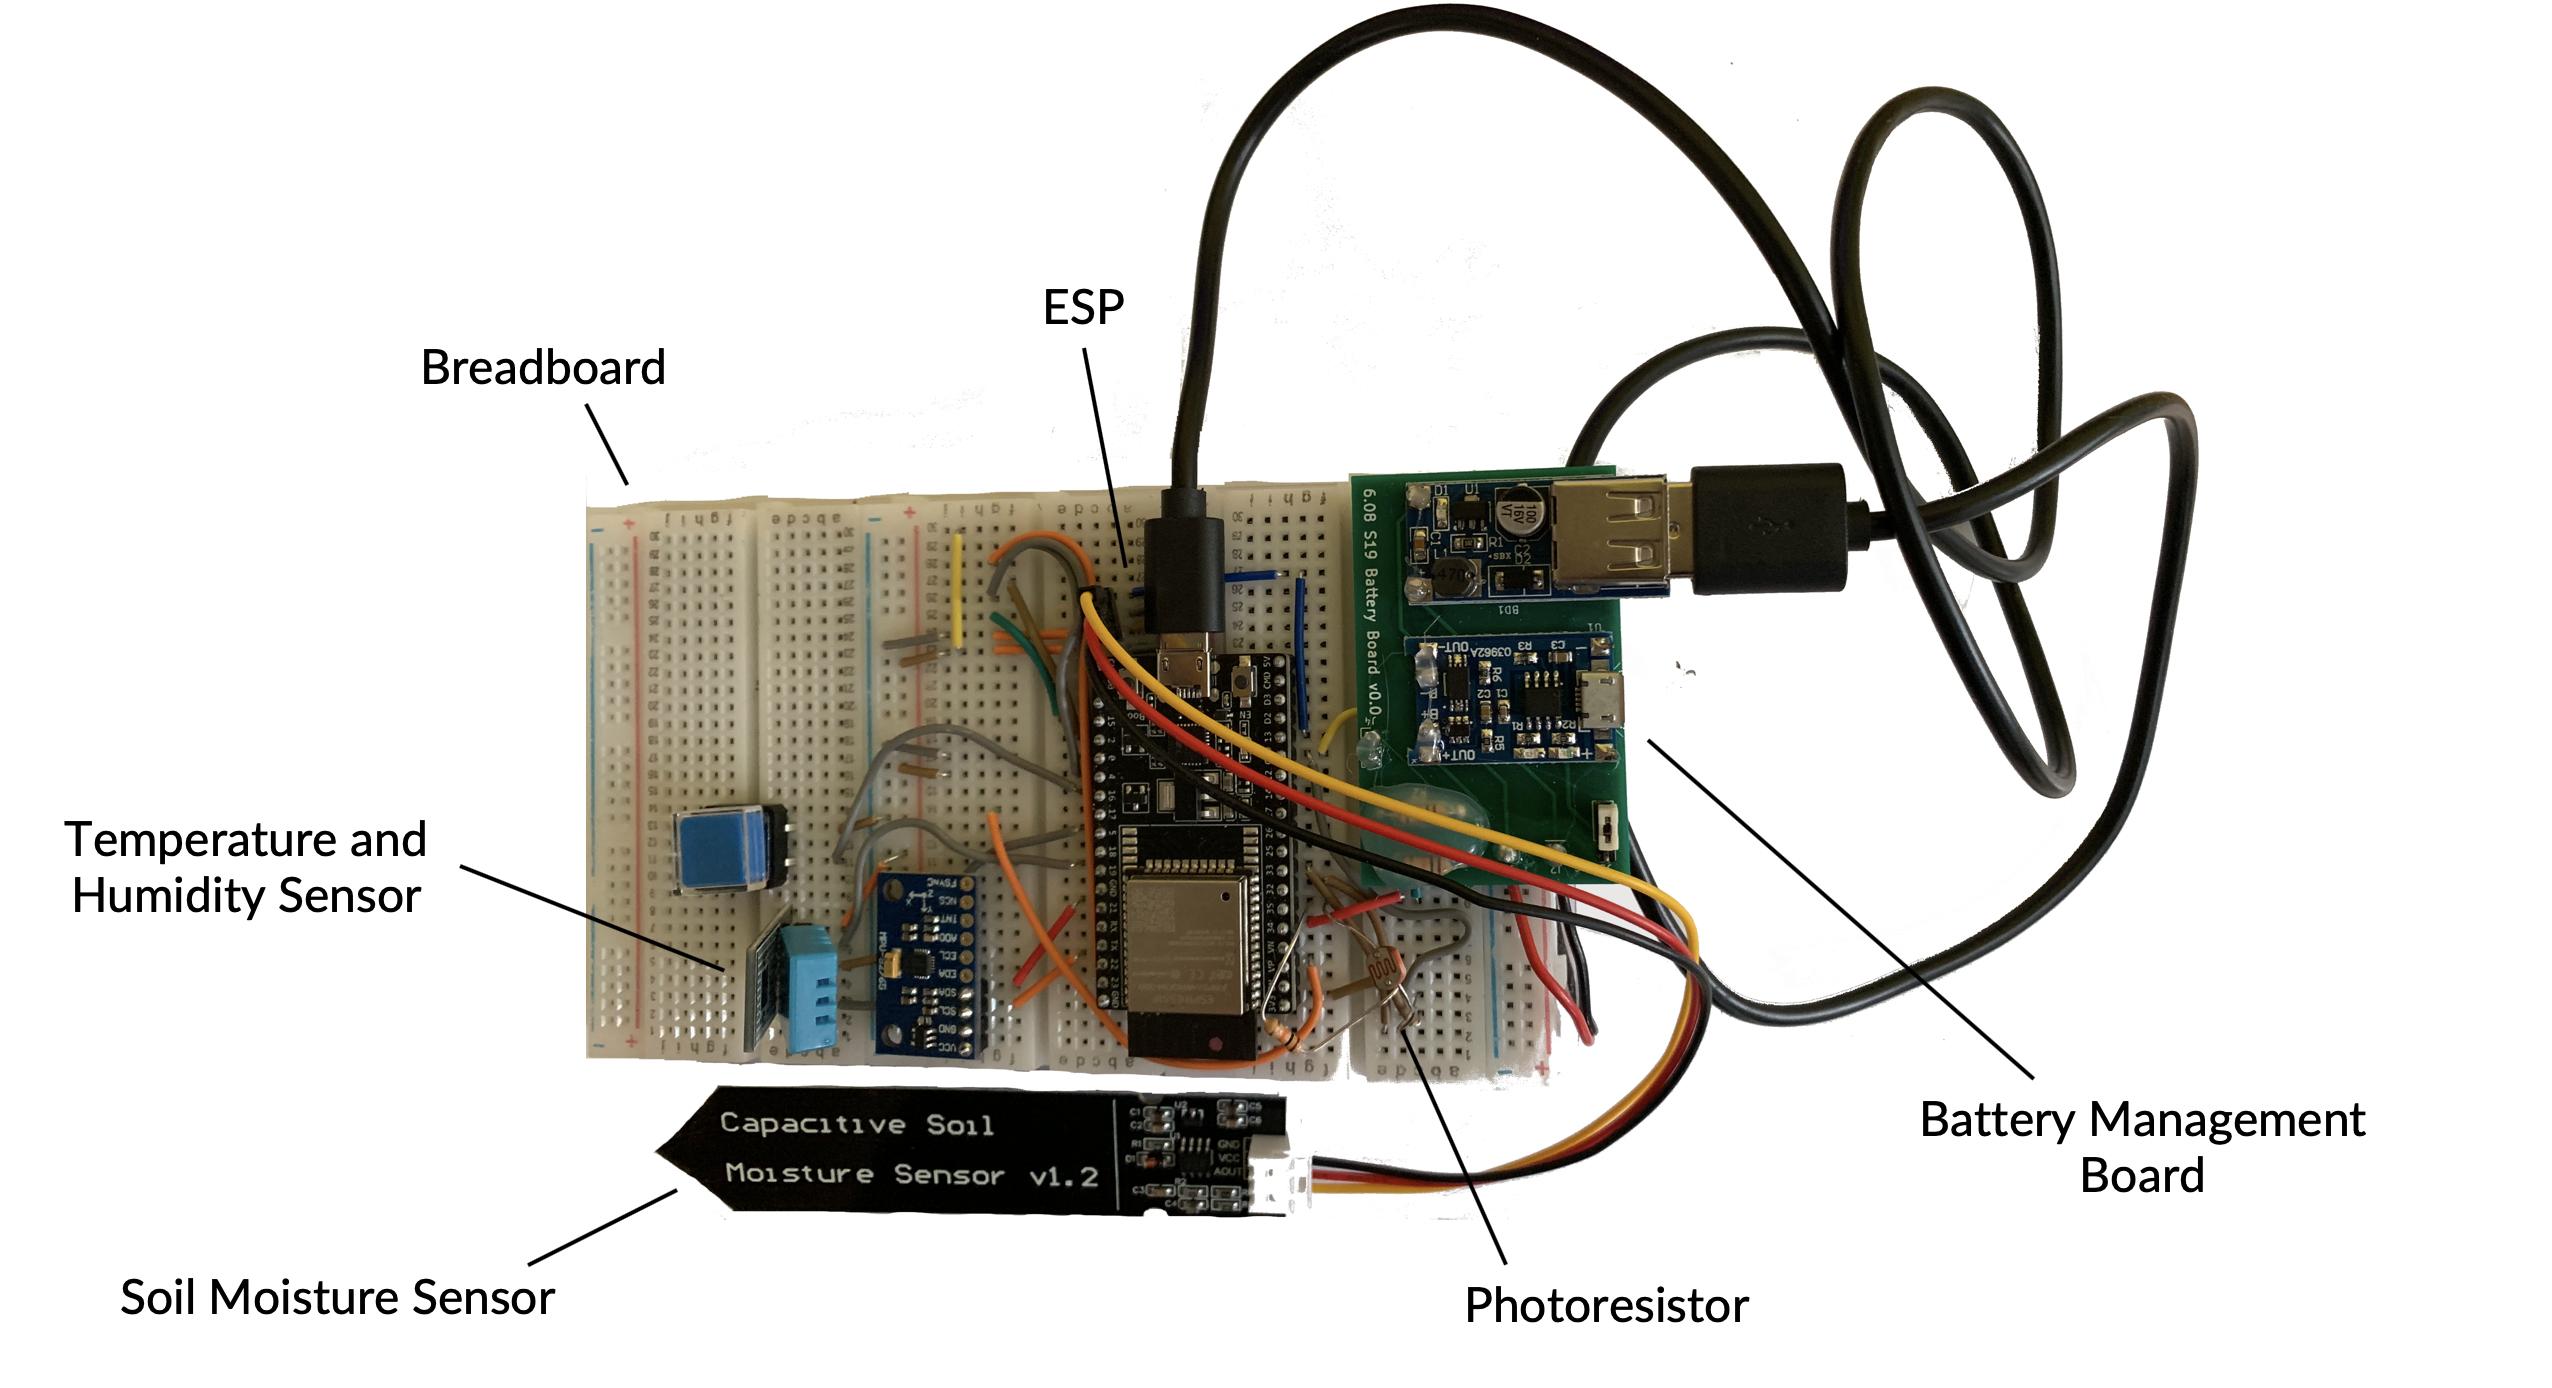 berrySmart - Keysight IoT Innovation Challenge